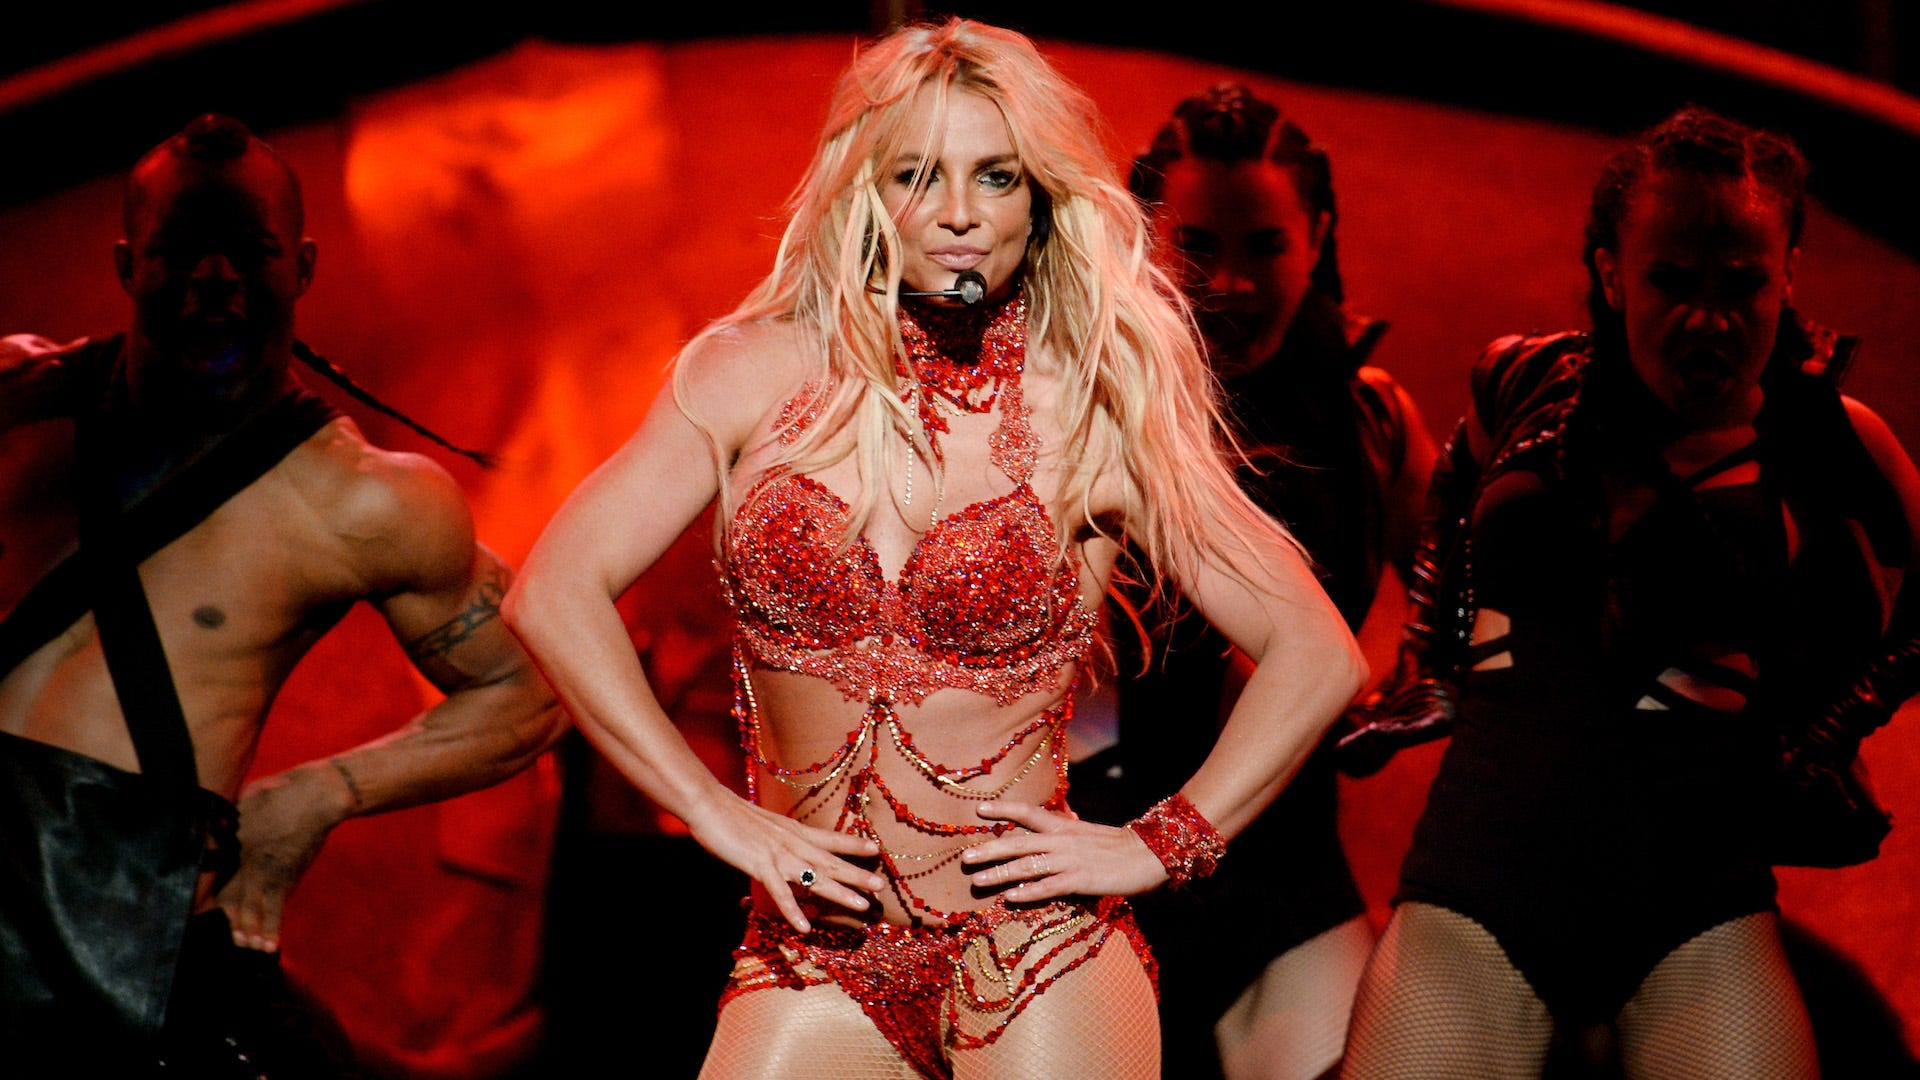 Britney Spears under investigation for striking employee: Report